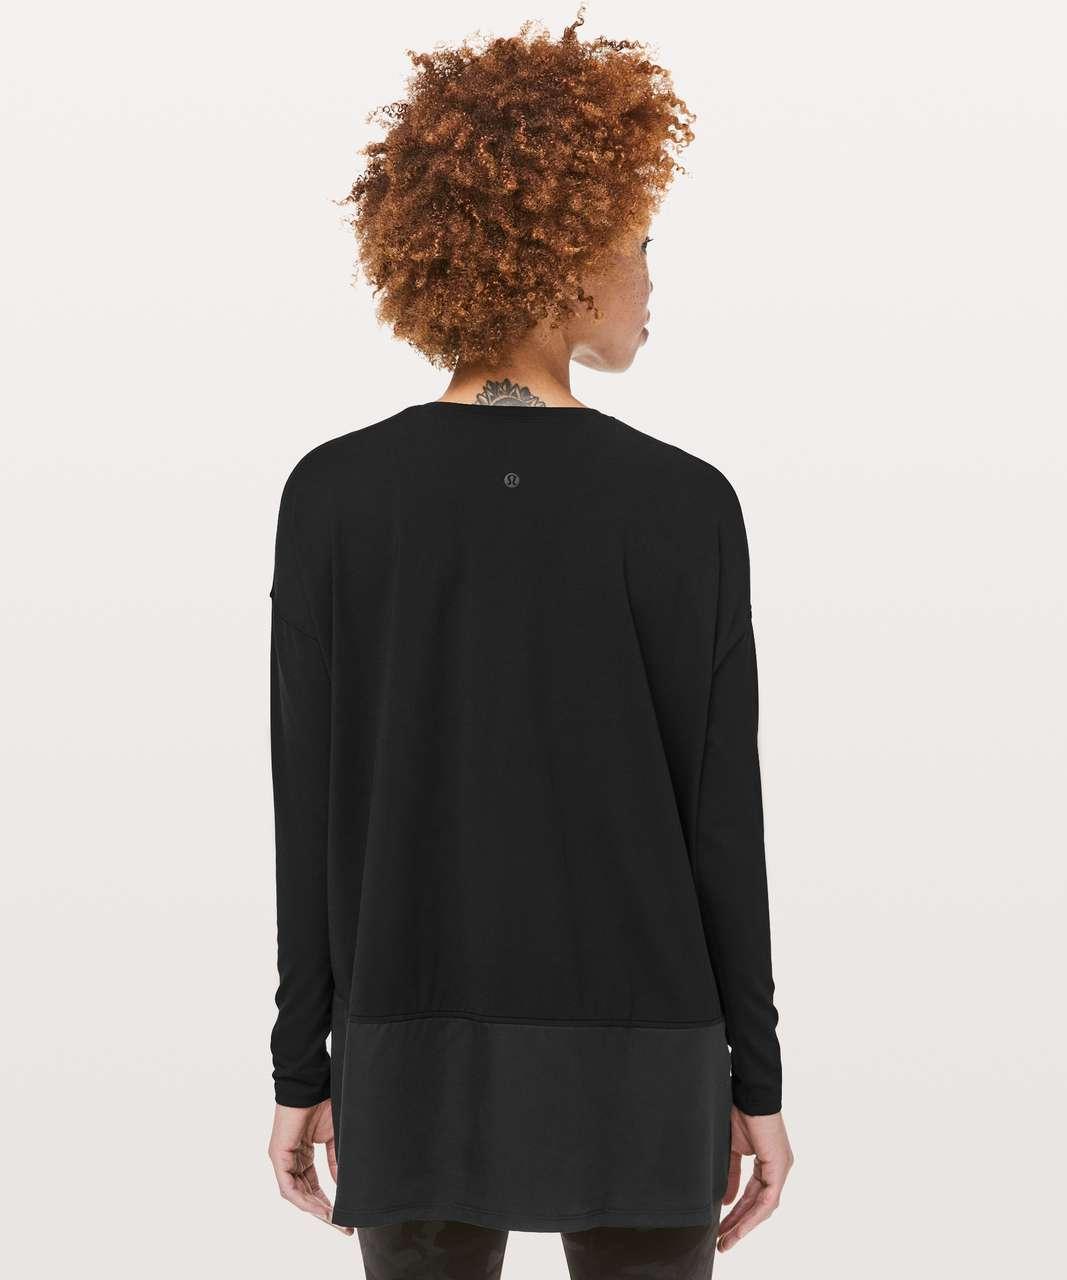 Lululemon Ease of Mind Long Sleeve - Black